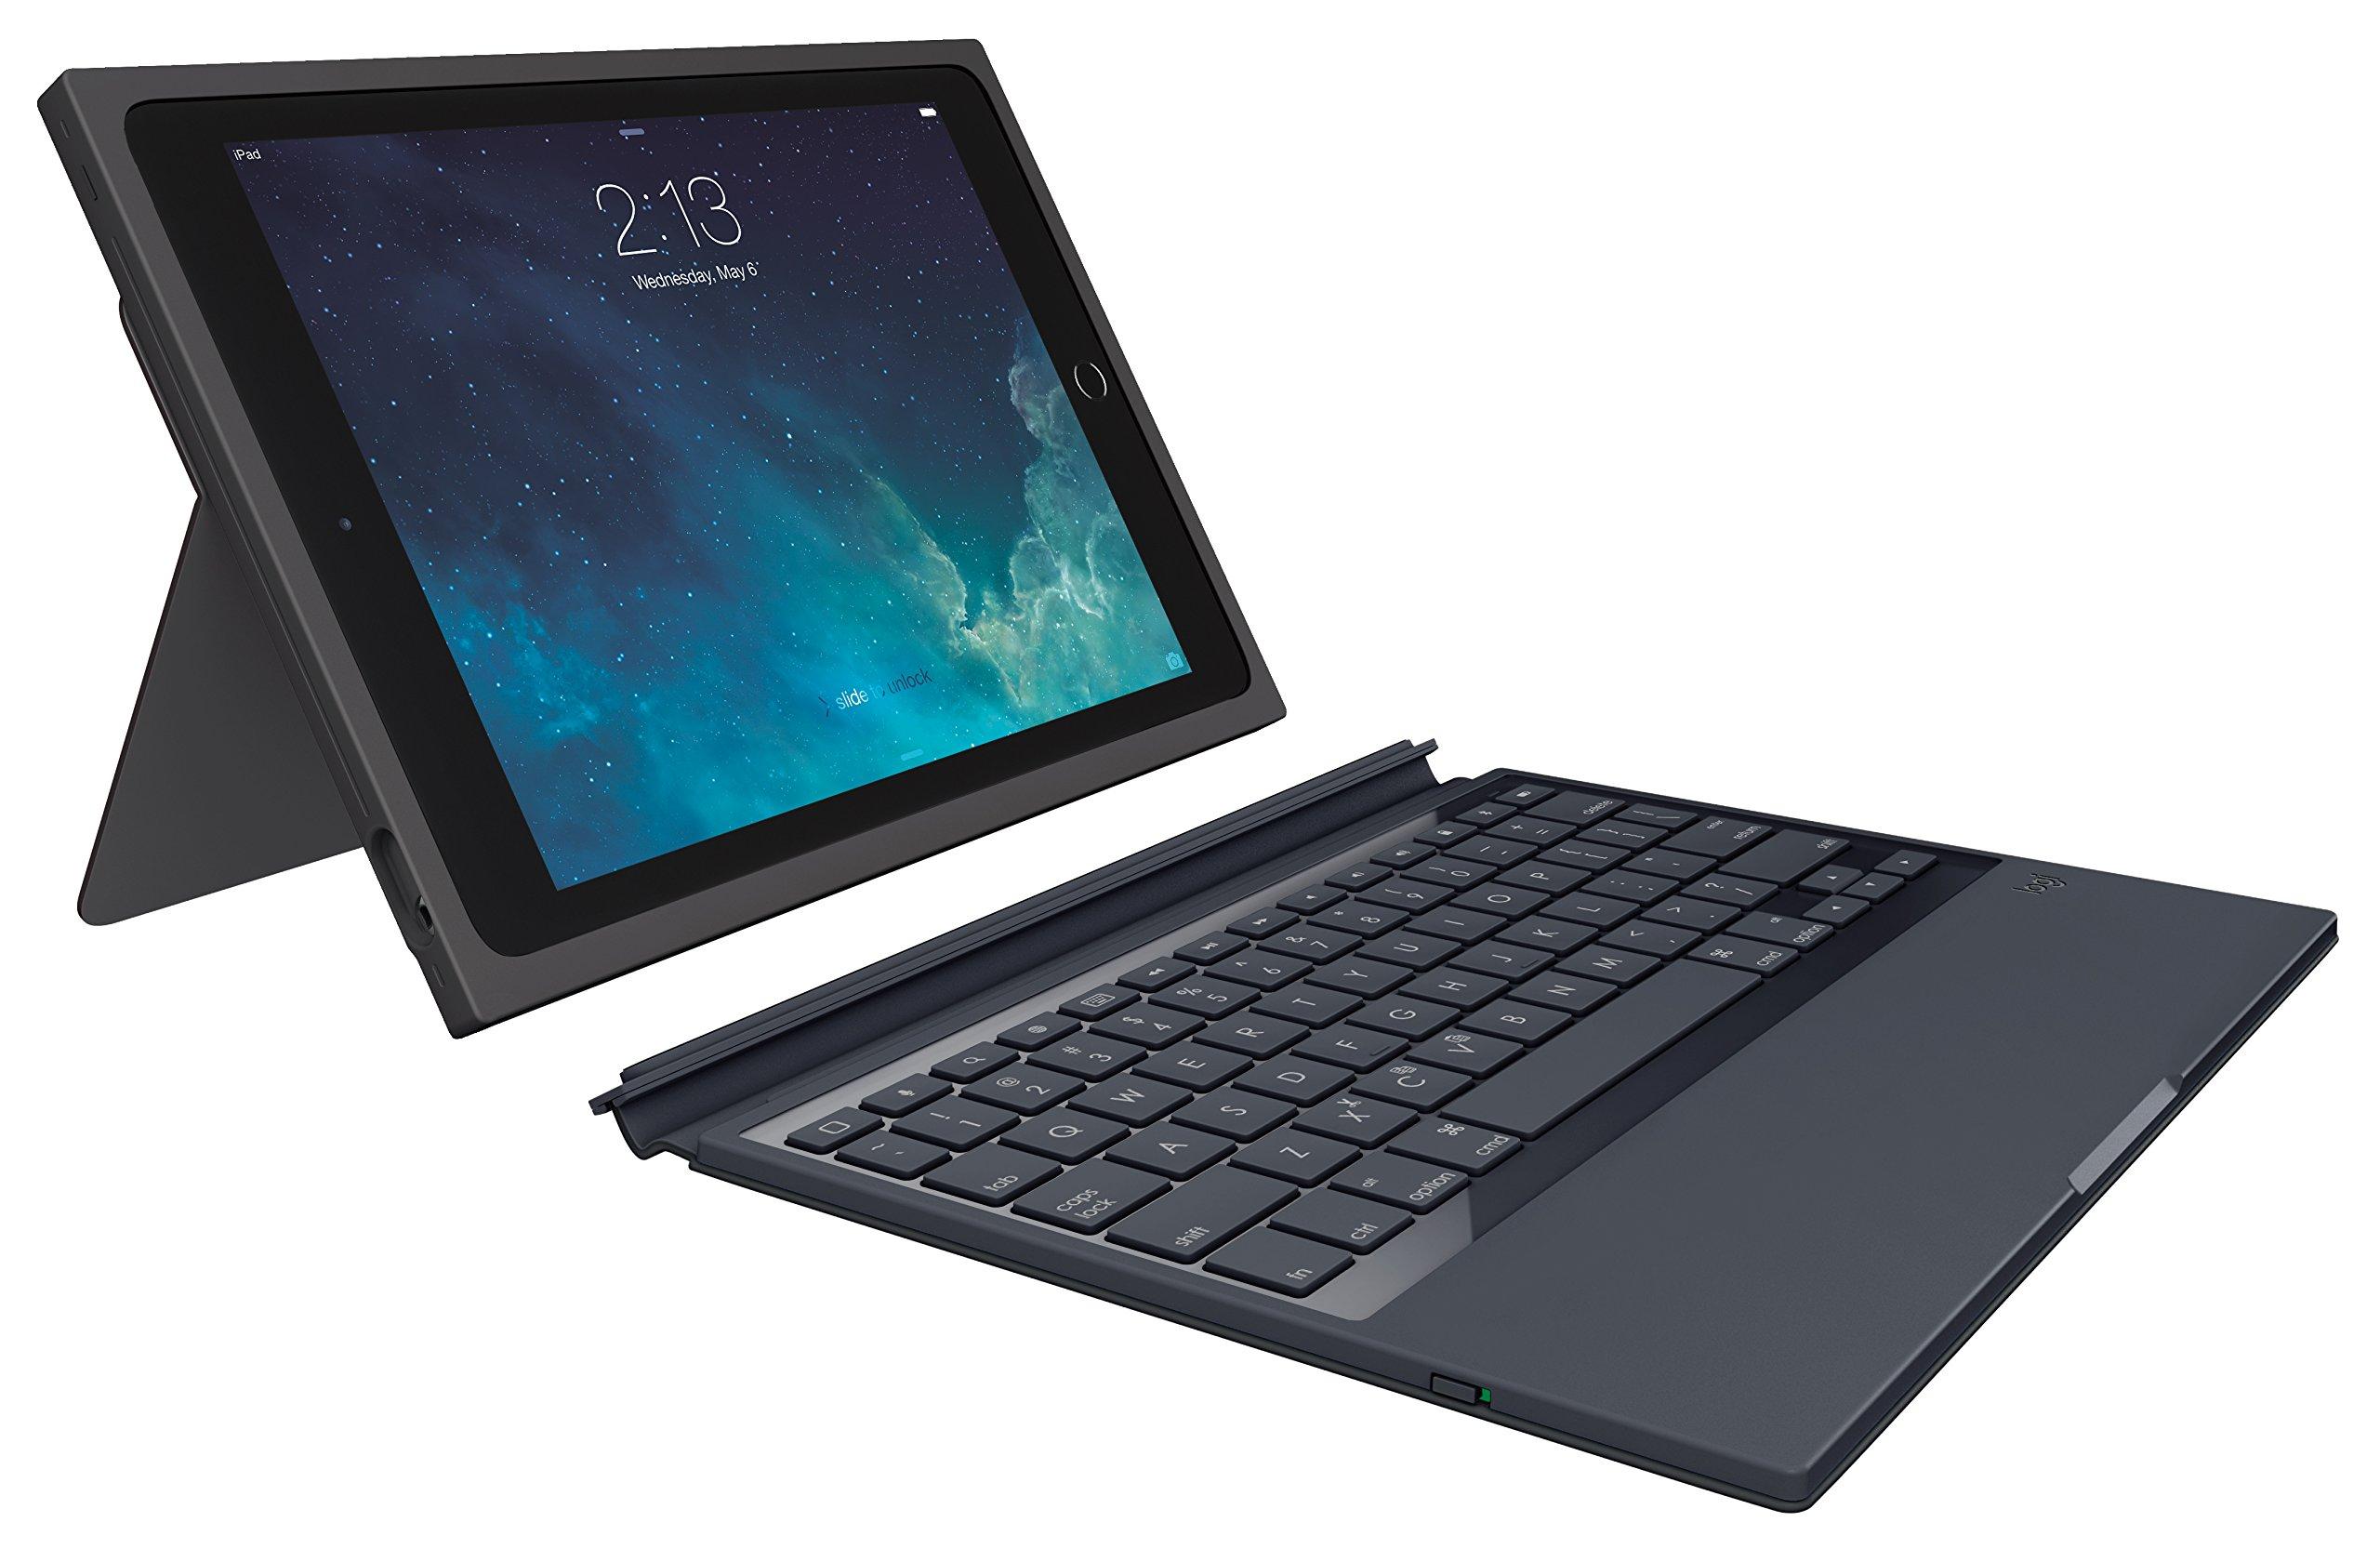 Logitech Blok Protective Keyboard Case For Ipad Air 2 Black (920-007417) 10